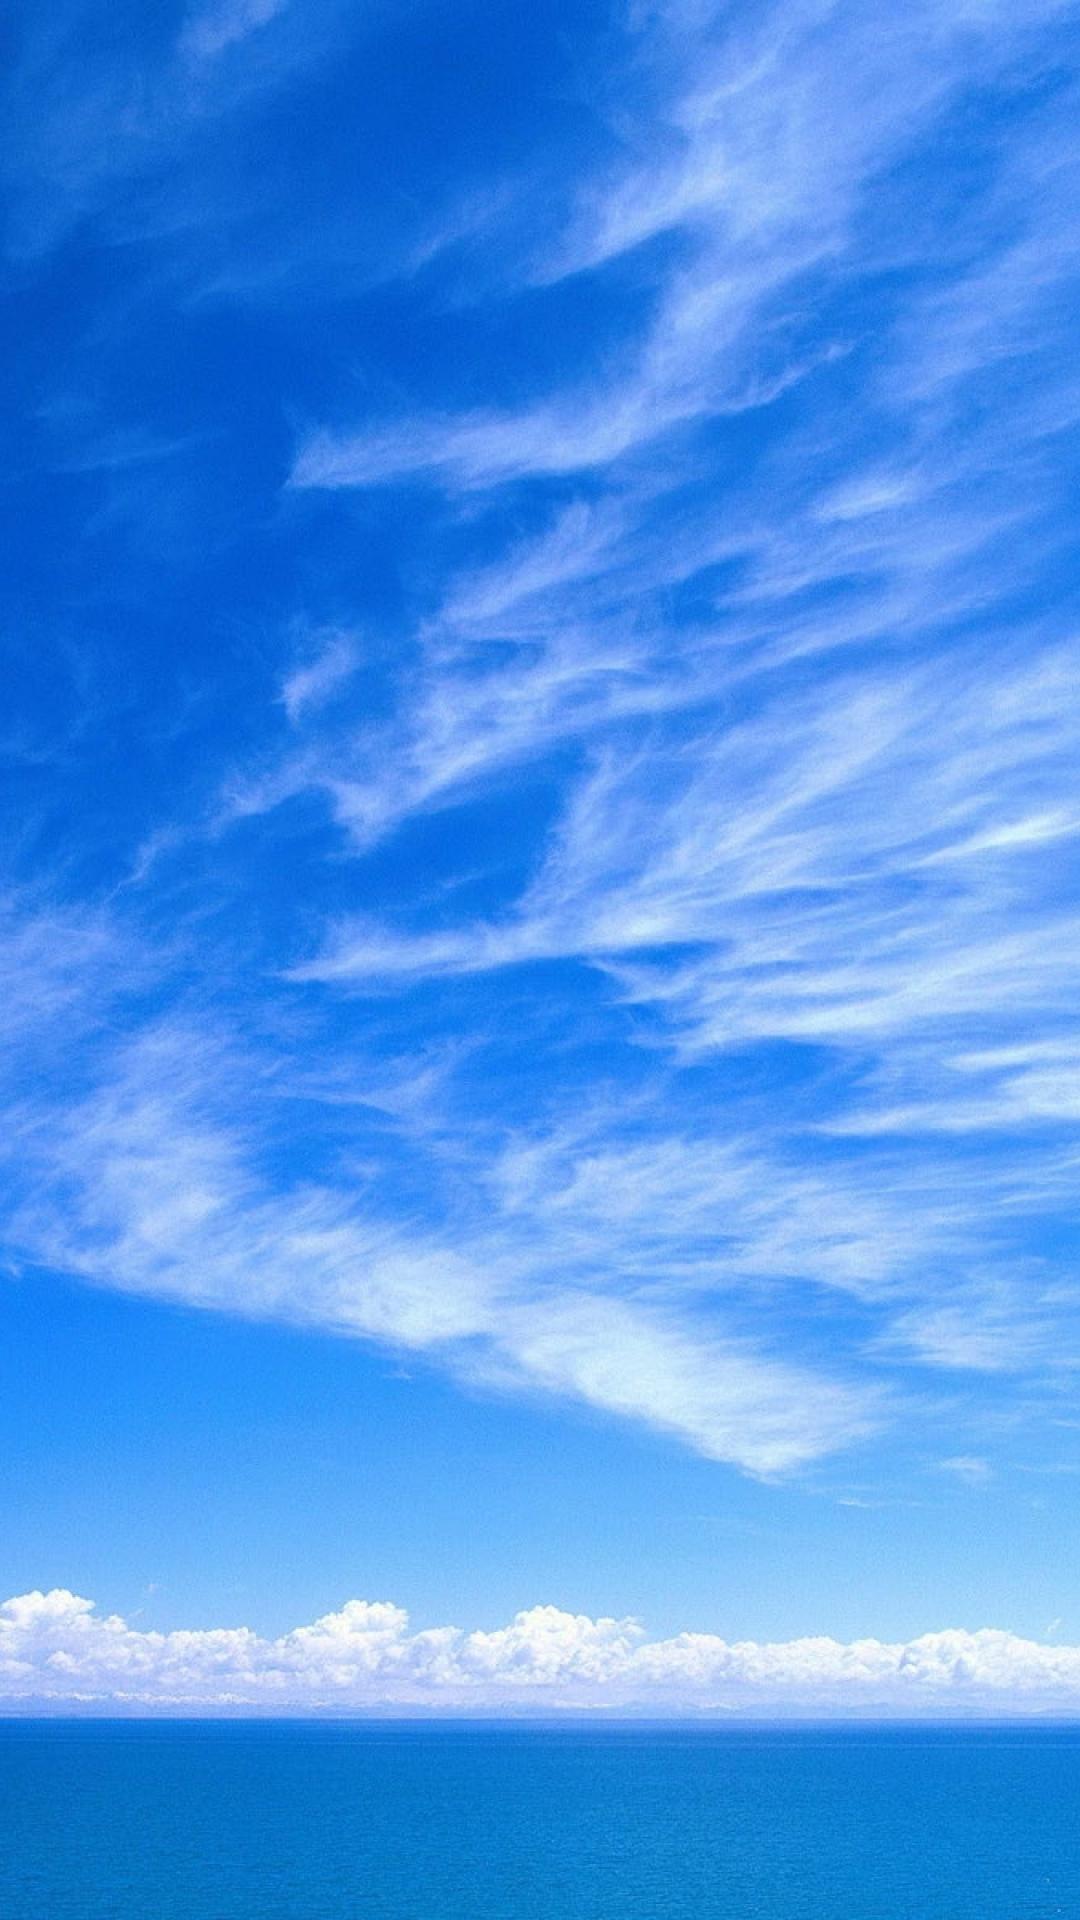 Sky Wallpaper sky blue white clouds tenderness 4937 ...